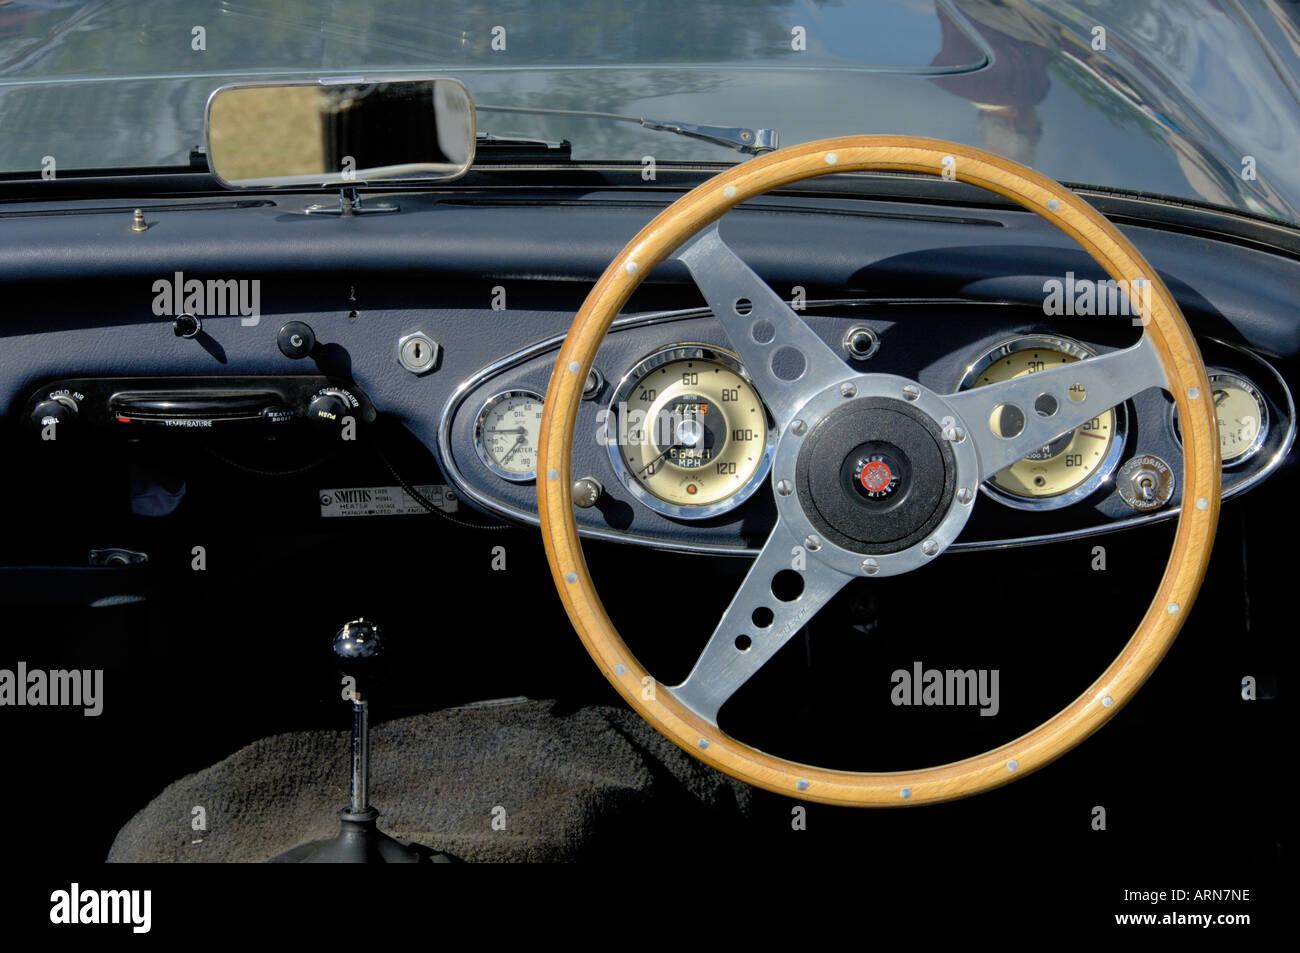 Wooden Steering Wheel Of Vintage British Car Austin Healey Stock